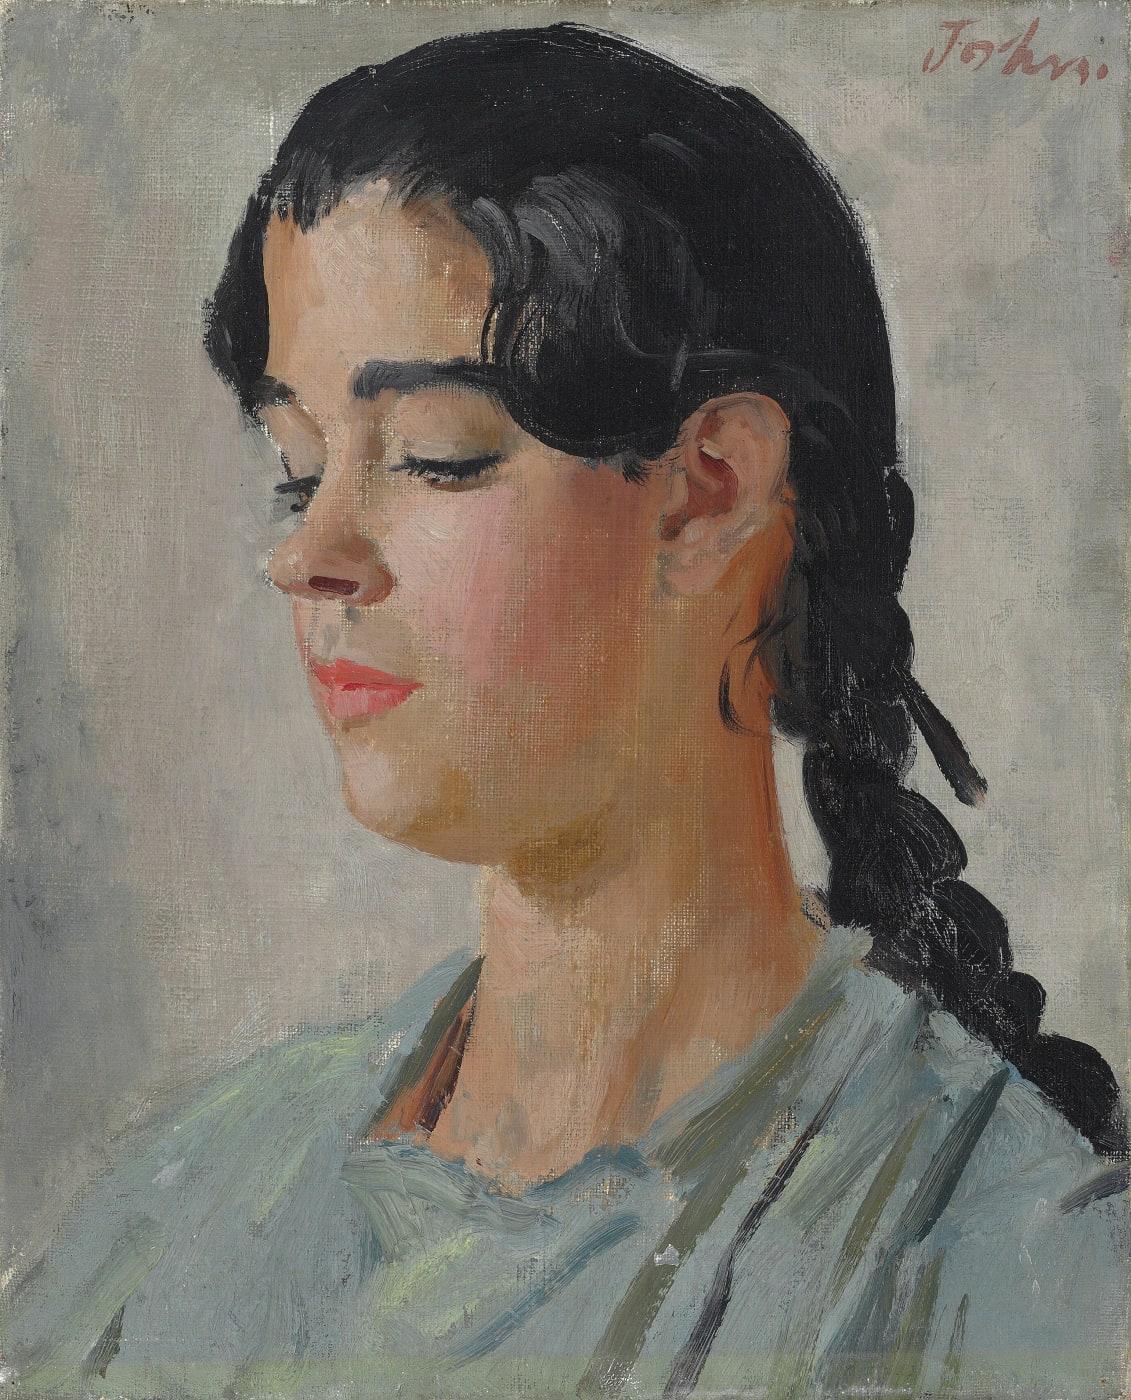 portrait of josepha, by augustus edwin john. Josepha wears a blue top and has black hair, she is looking down